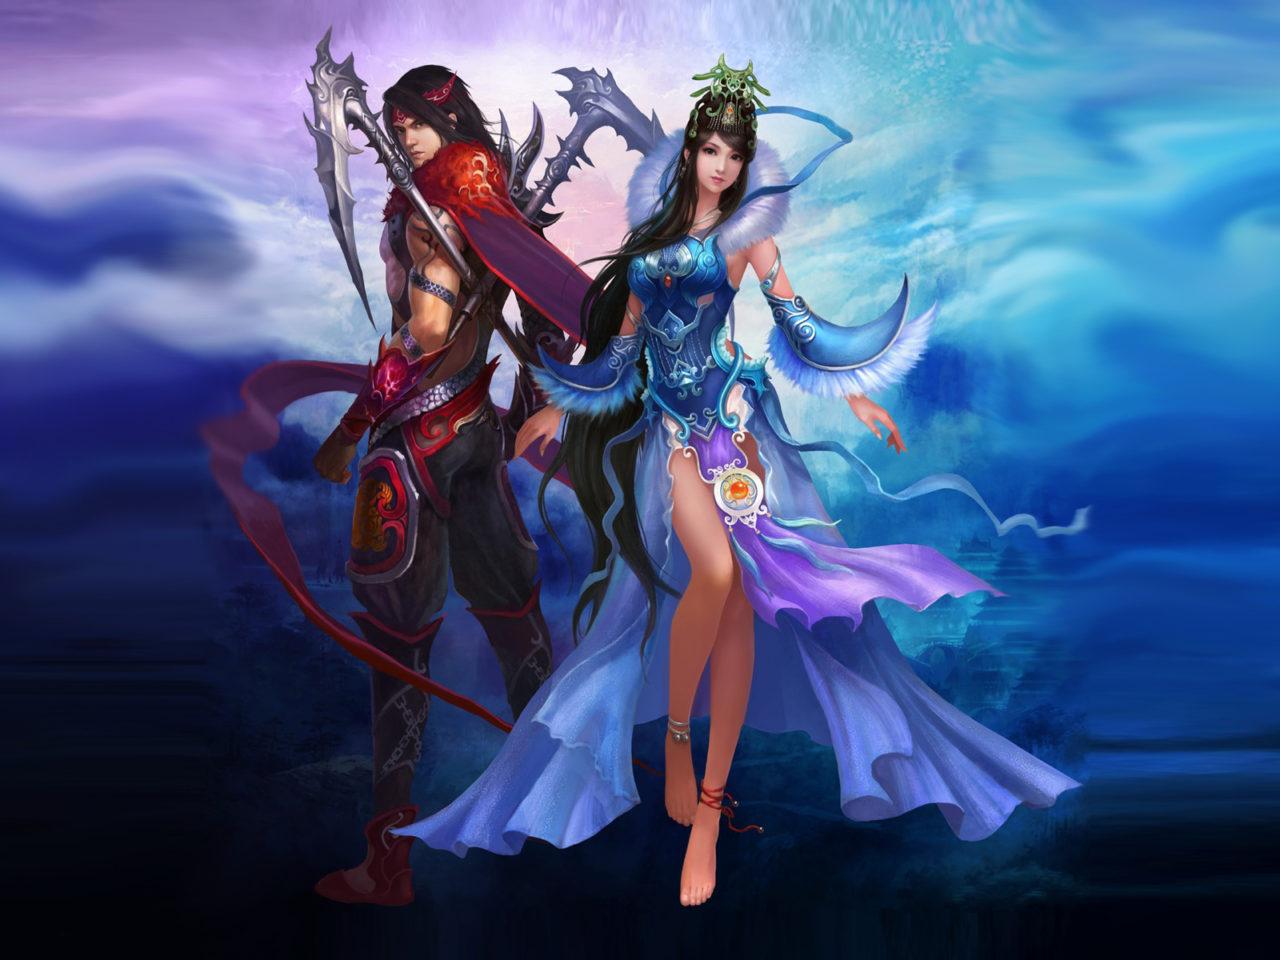 Dota 3d Wallpaper Jade Dynasty Video Game Desktop Wallpaper Hd Resolution